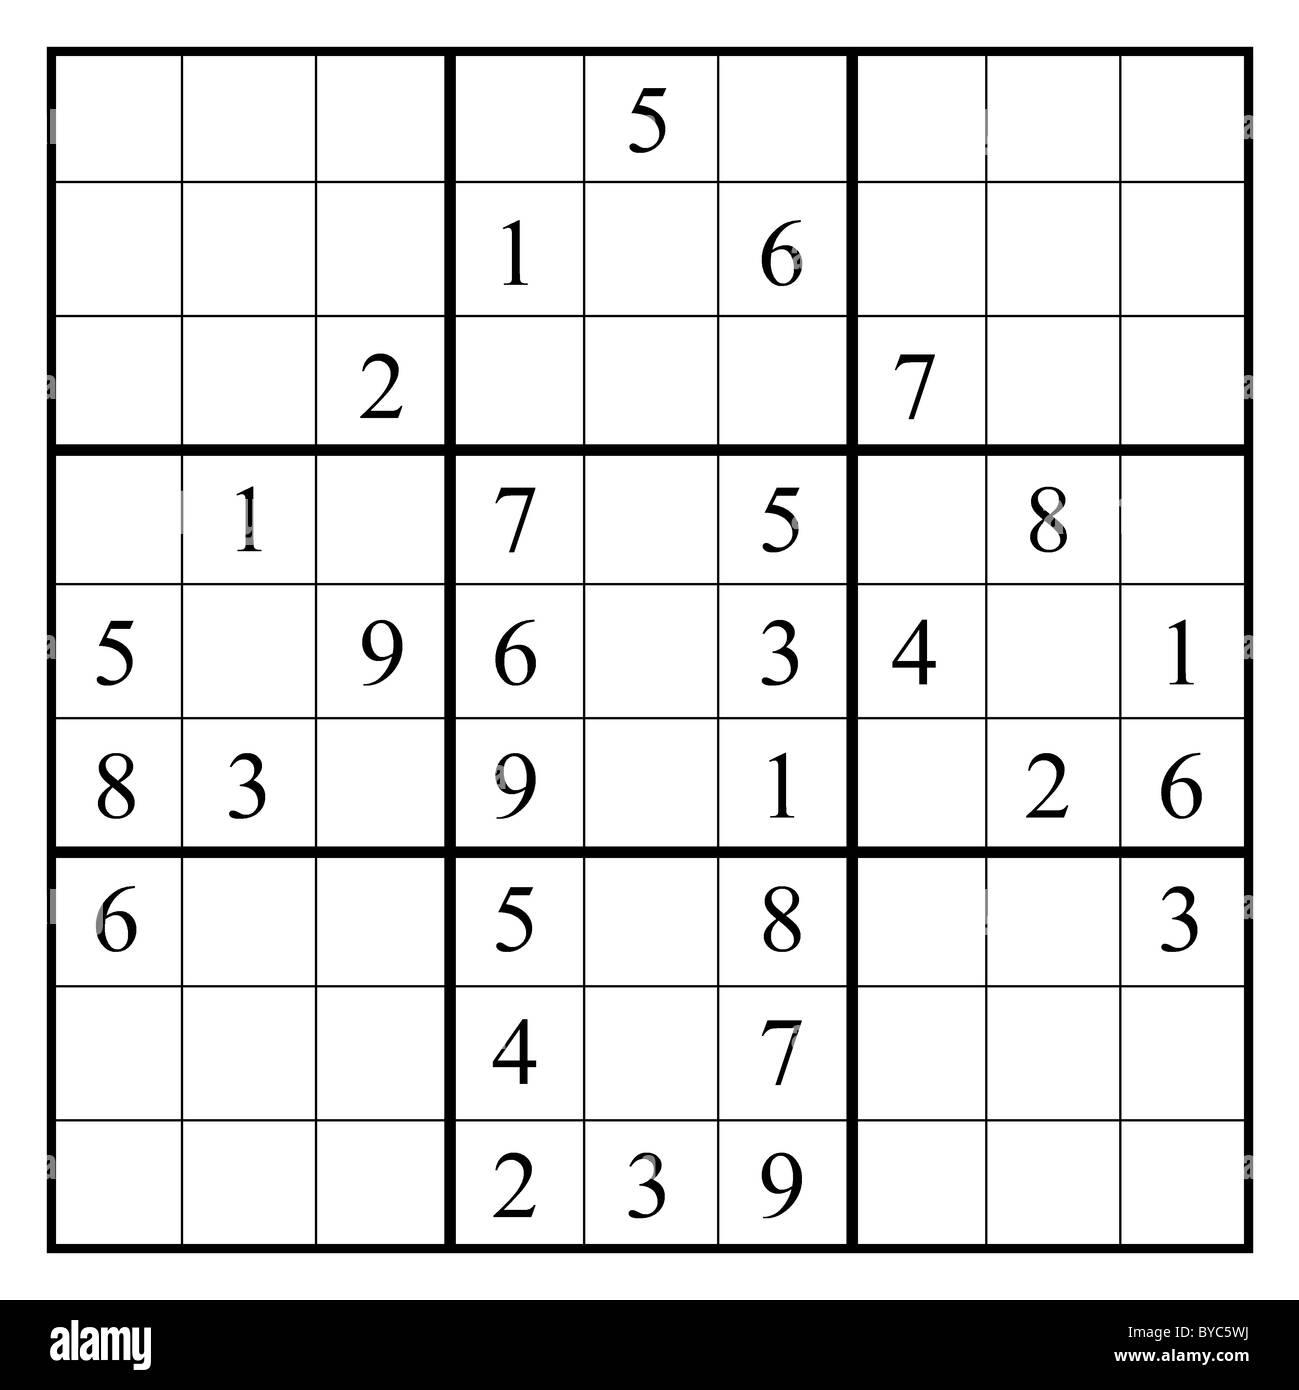 Sudoku Illustration Stock Photos & Sudoku Illustration Stock Images ...